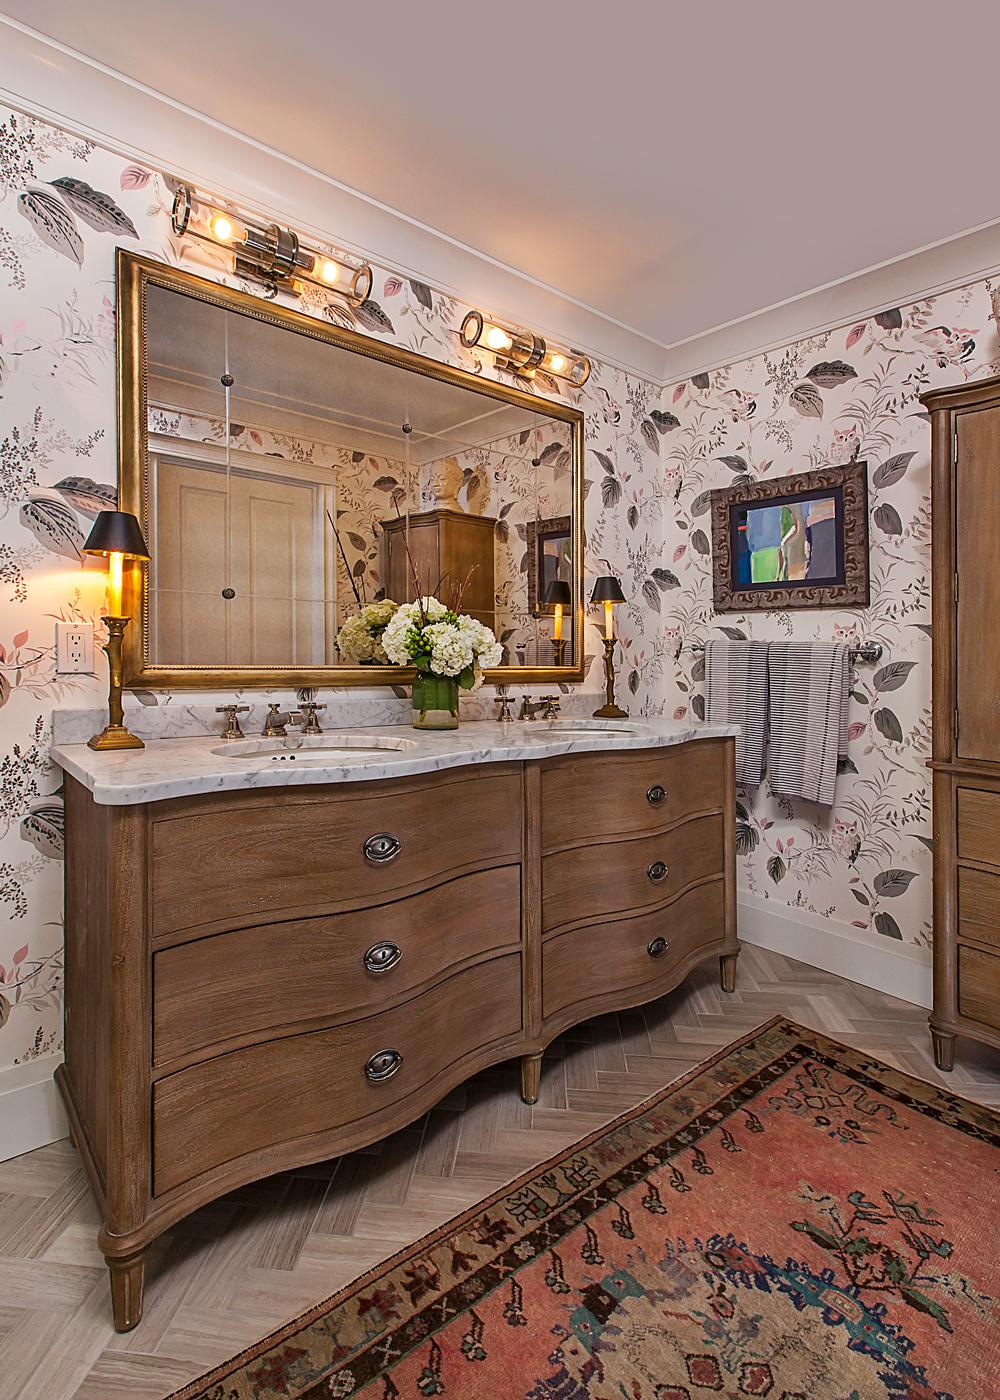 Bathroom rug and marble floors